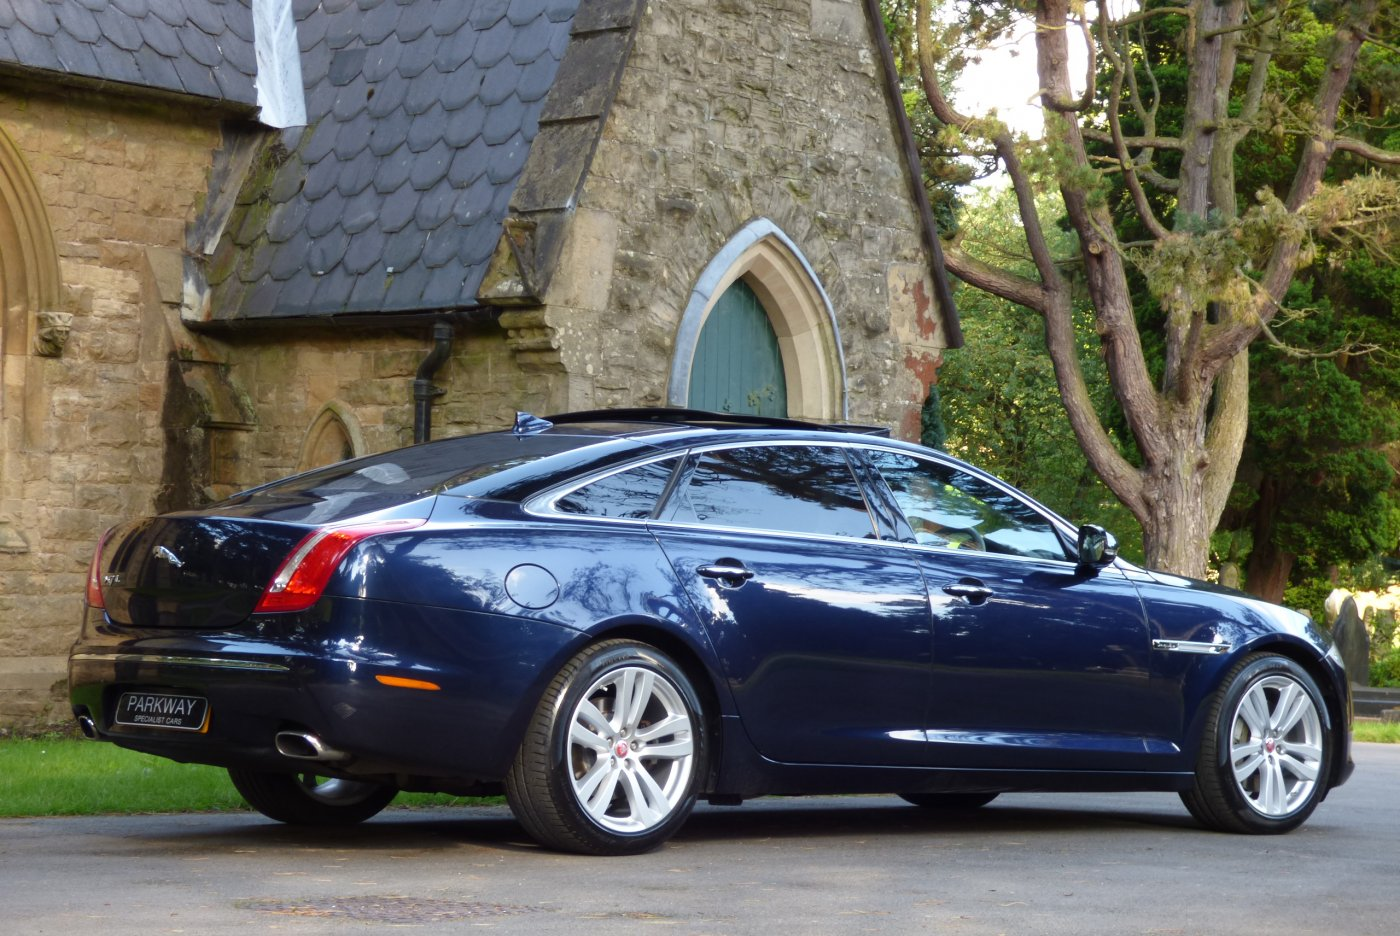 Jaguar Xj 3 0 D V6 Premium Luxury Lwb